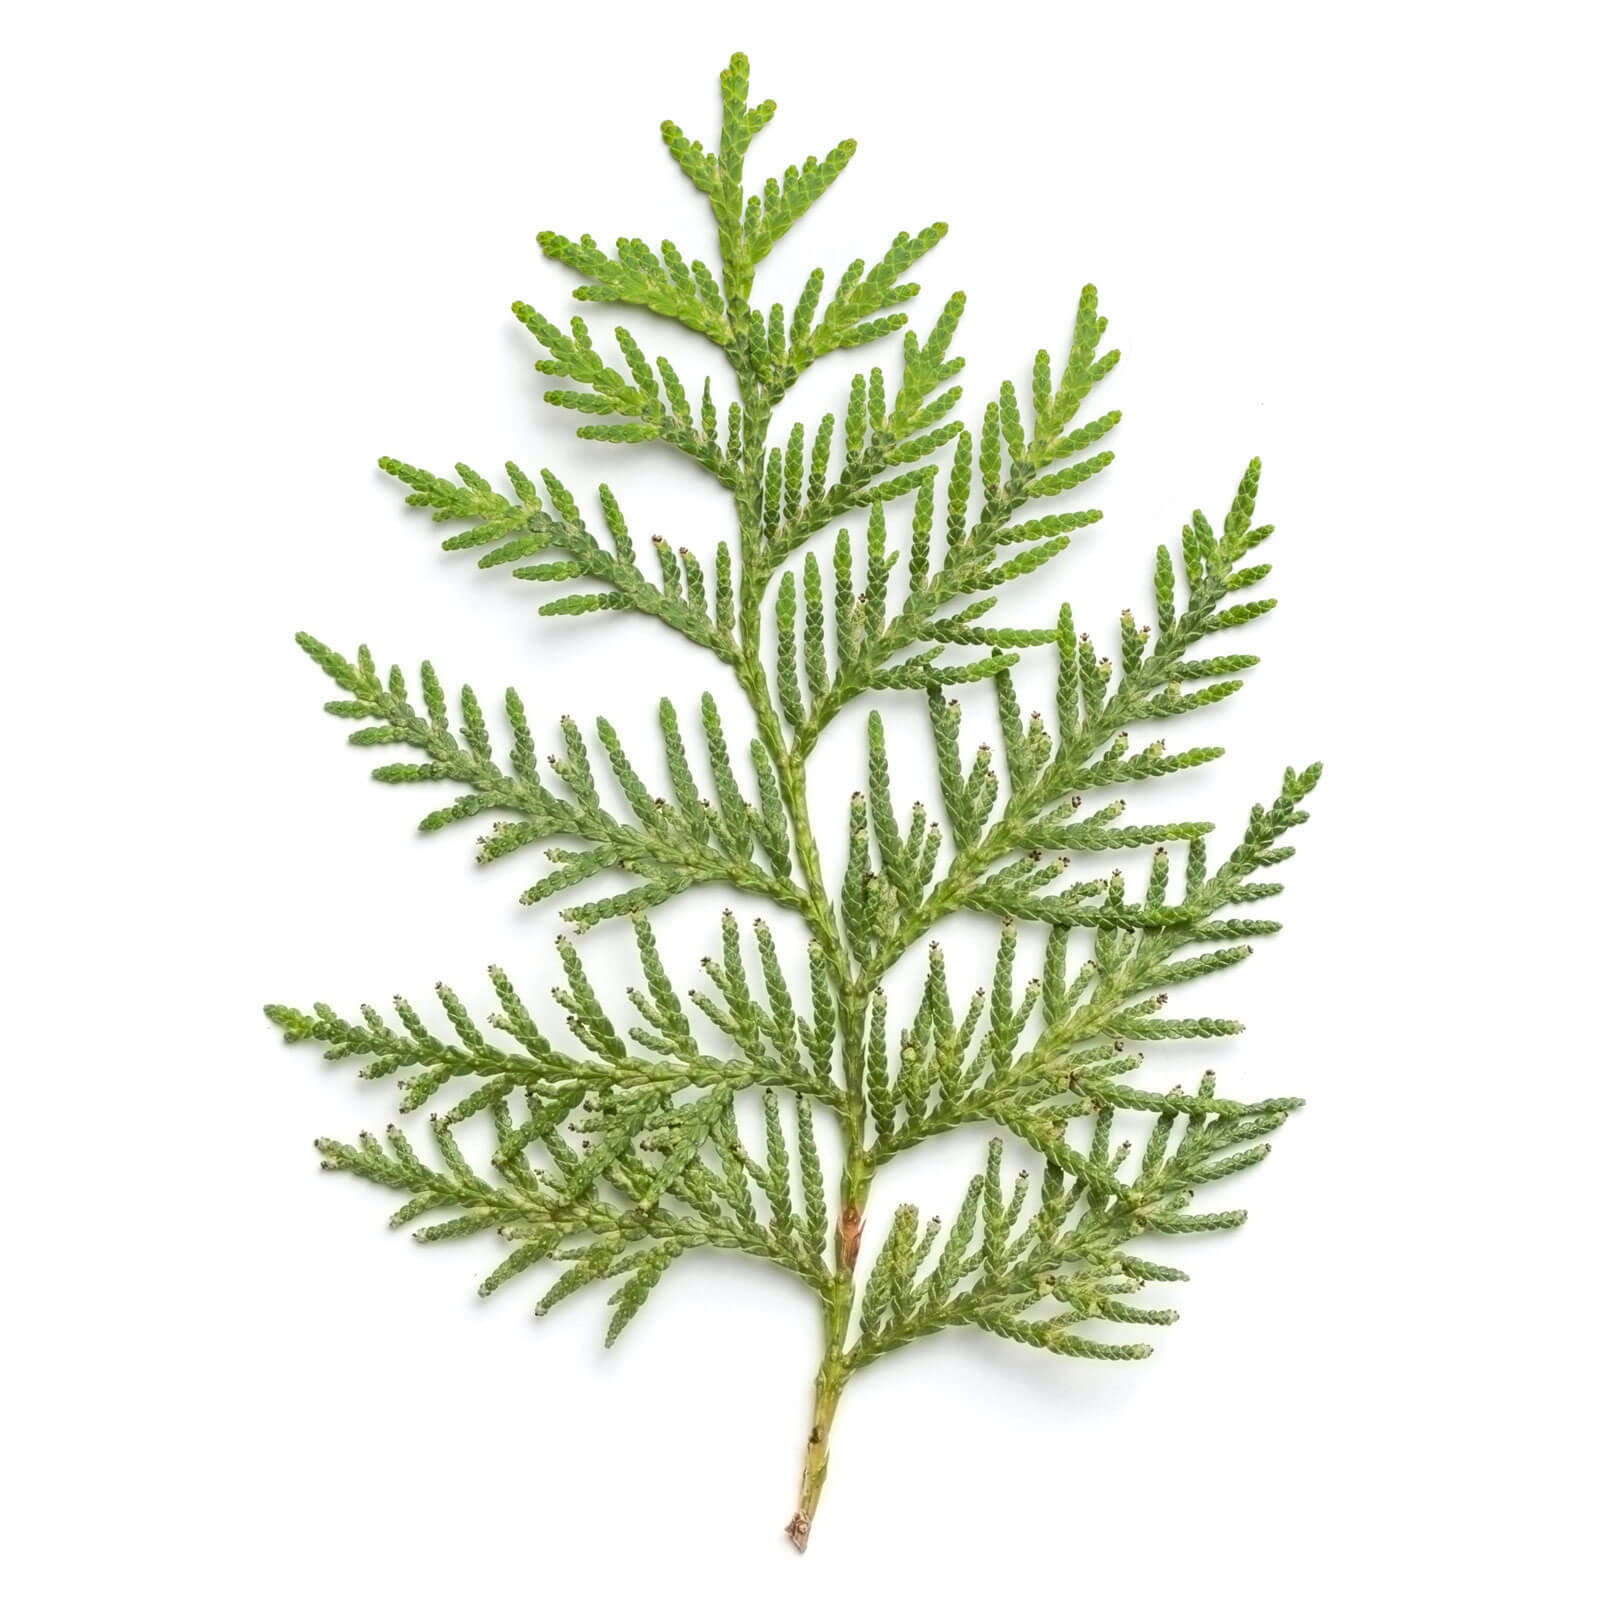 Cedar sprig